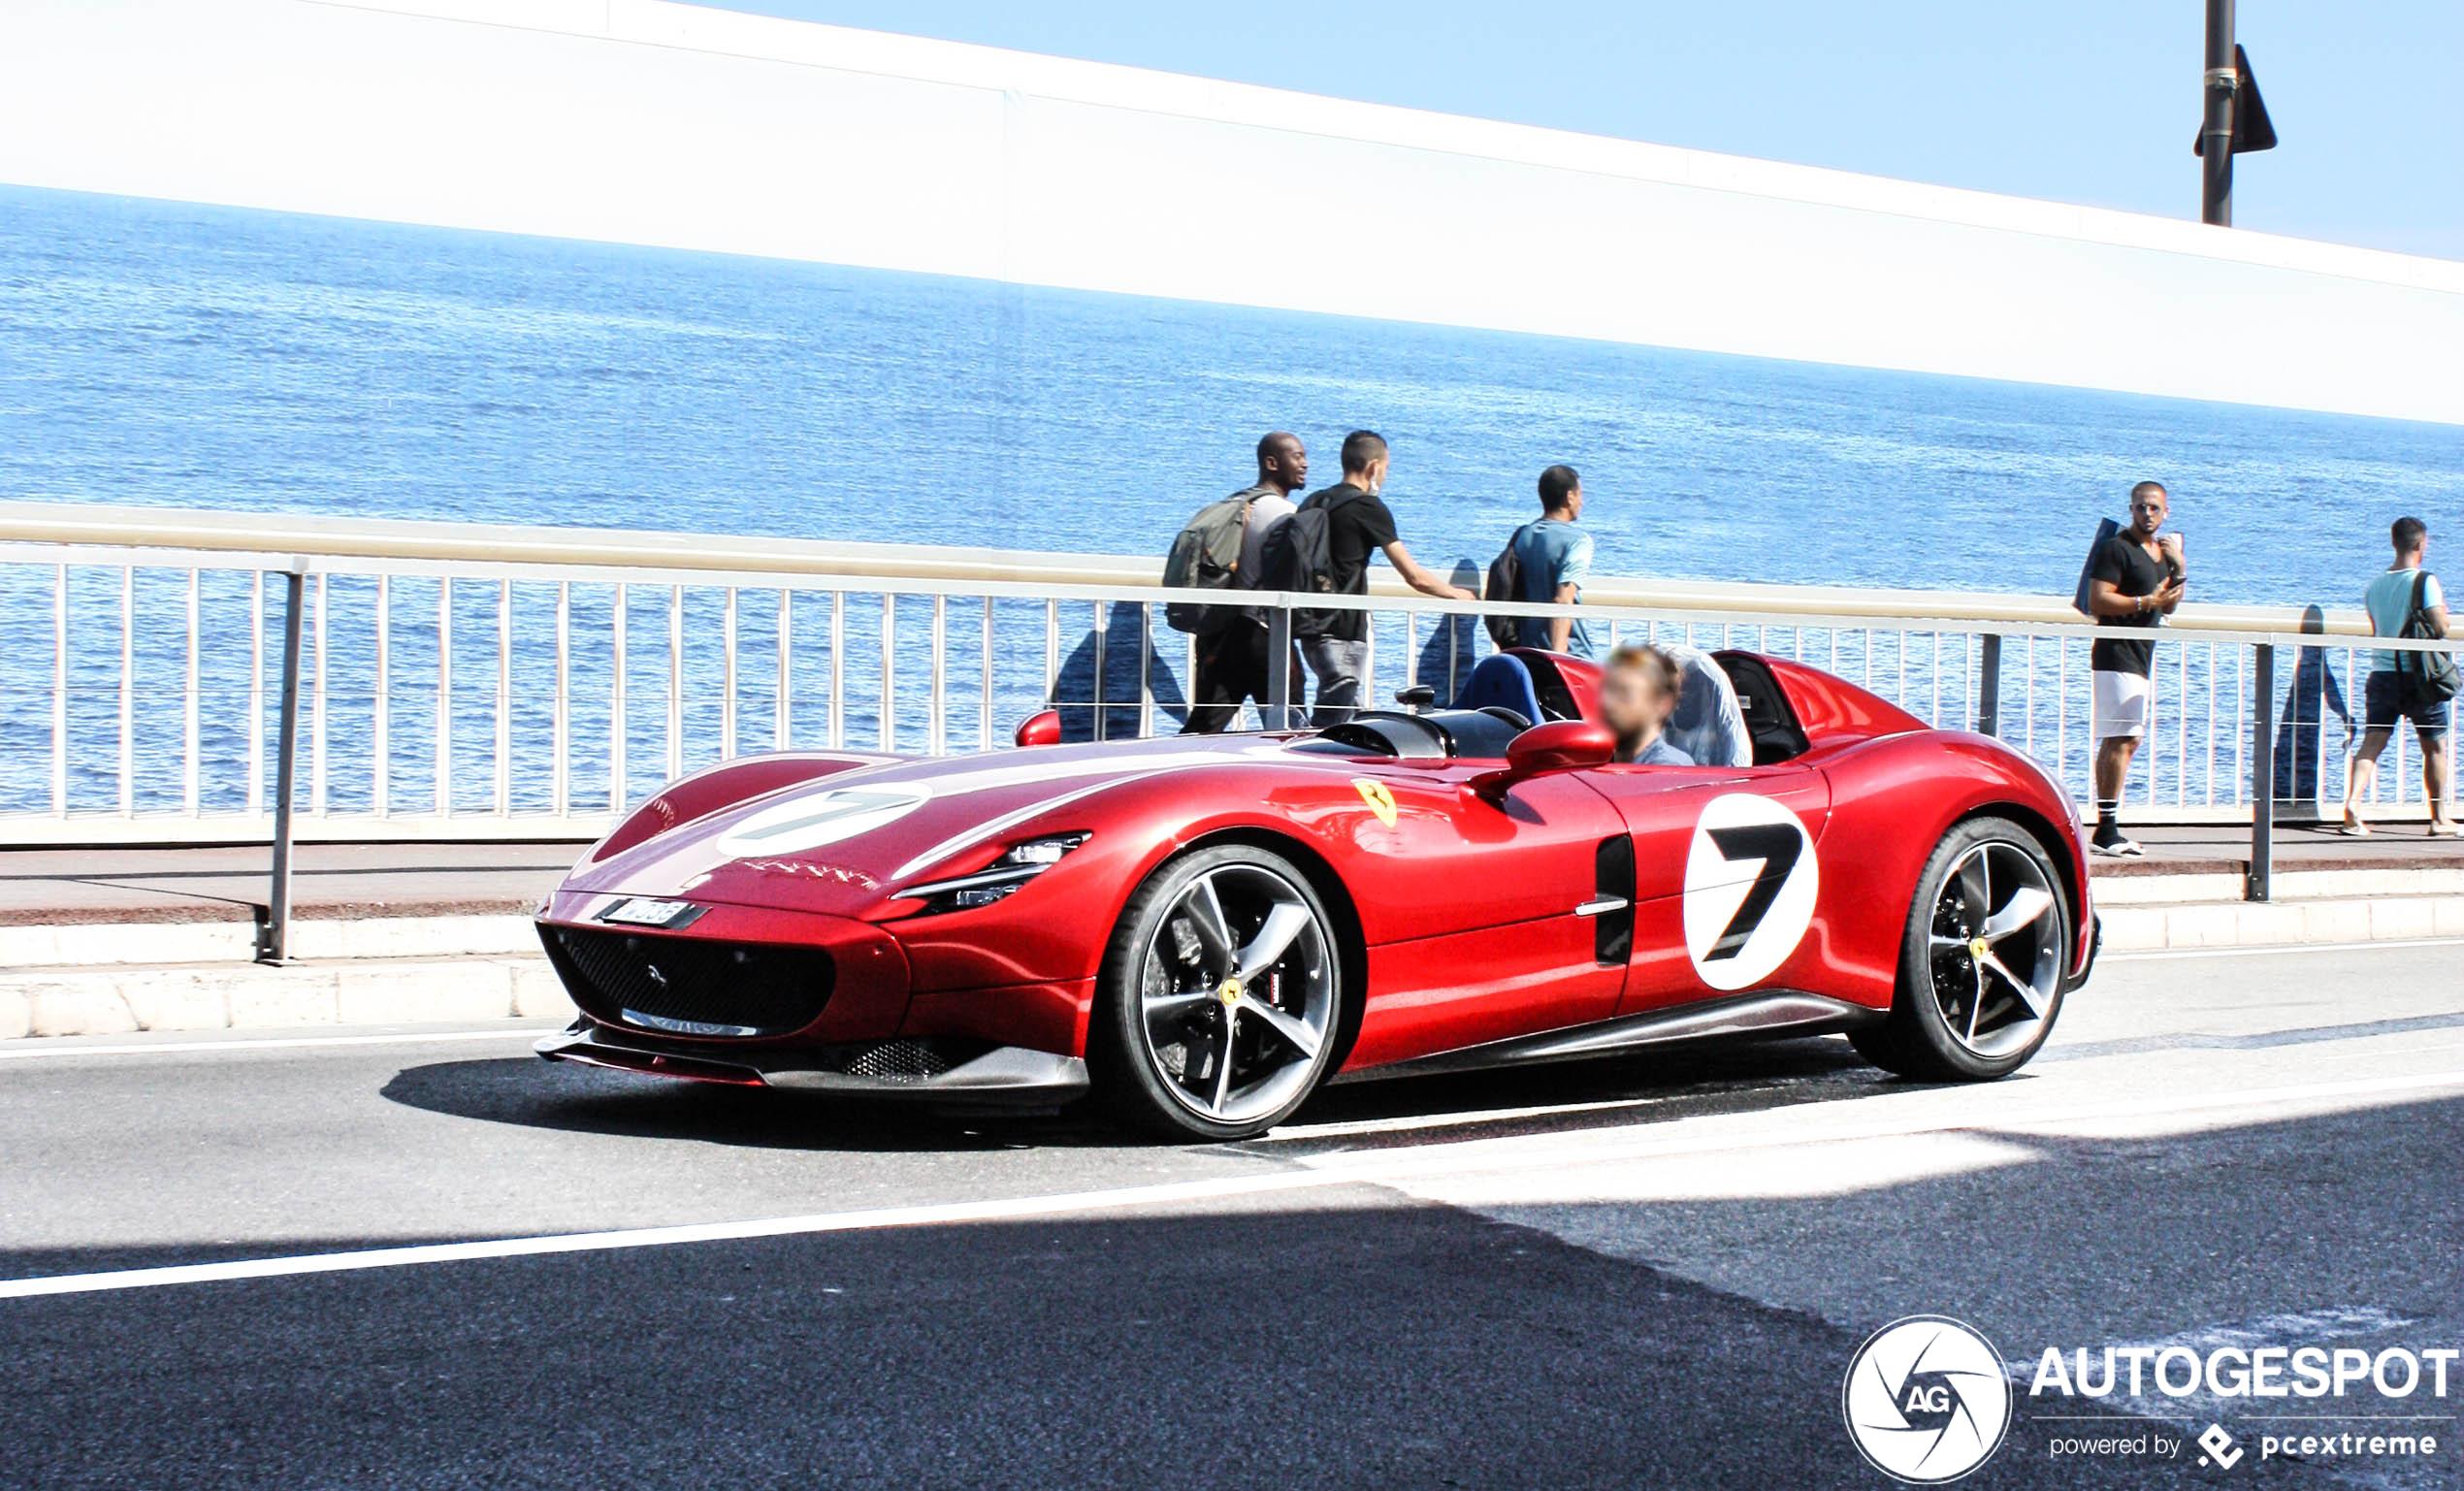 Ferrari Monza SP2 steelt de show in Monaco